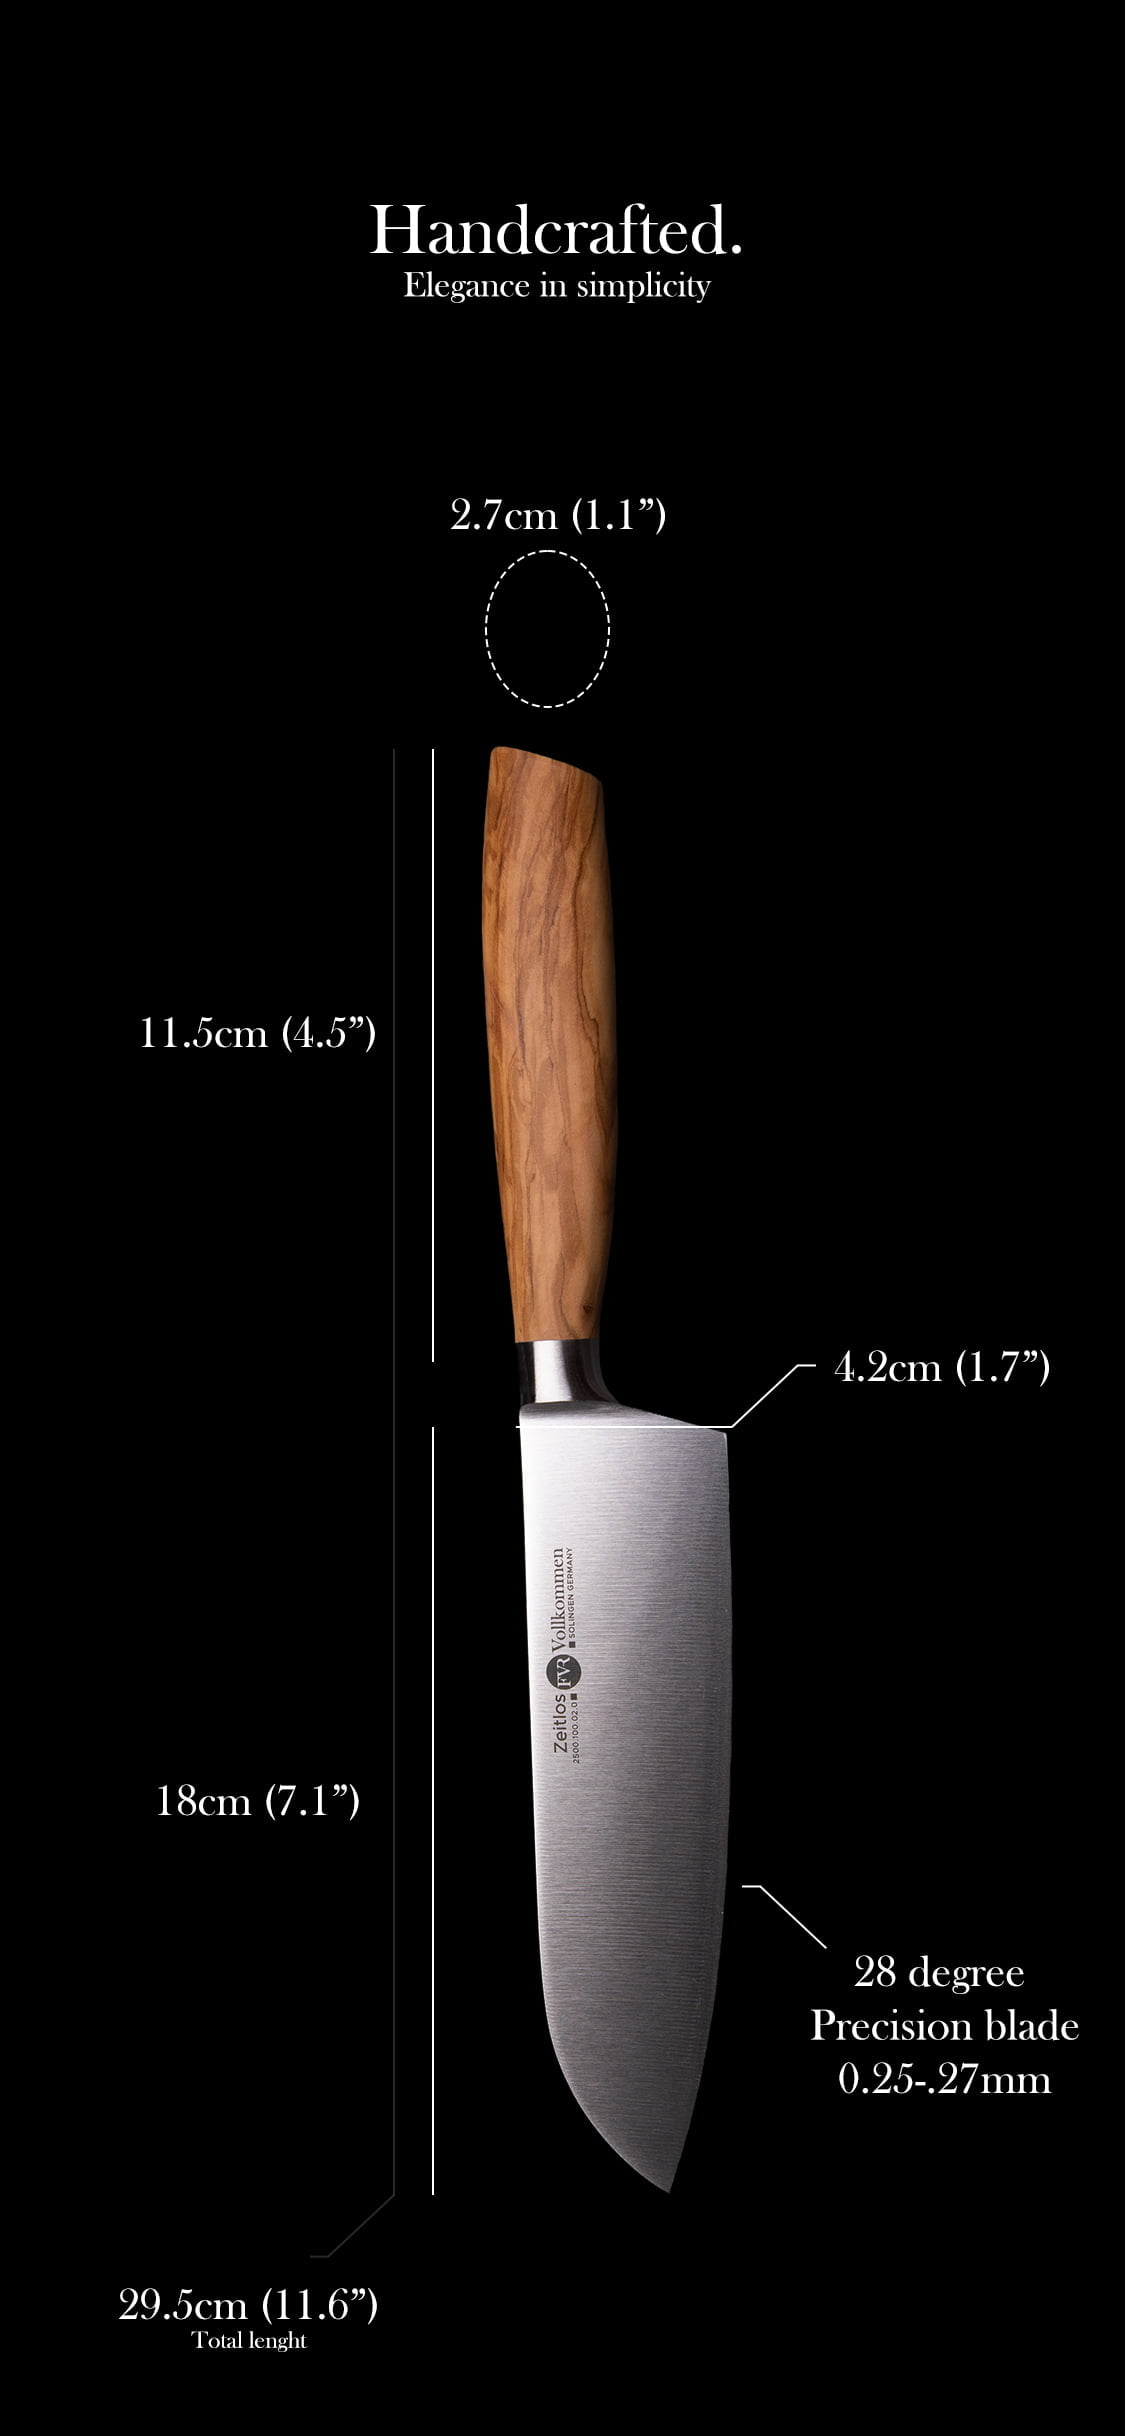 FVR Santoku Knife Specification